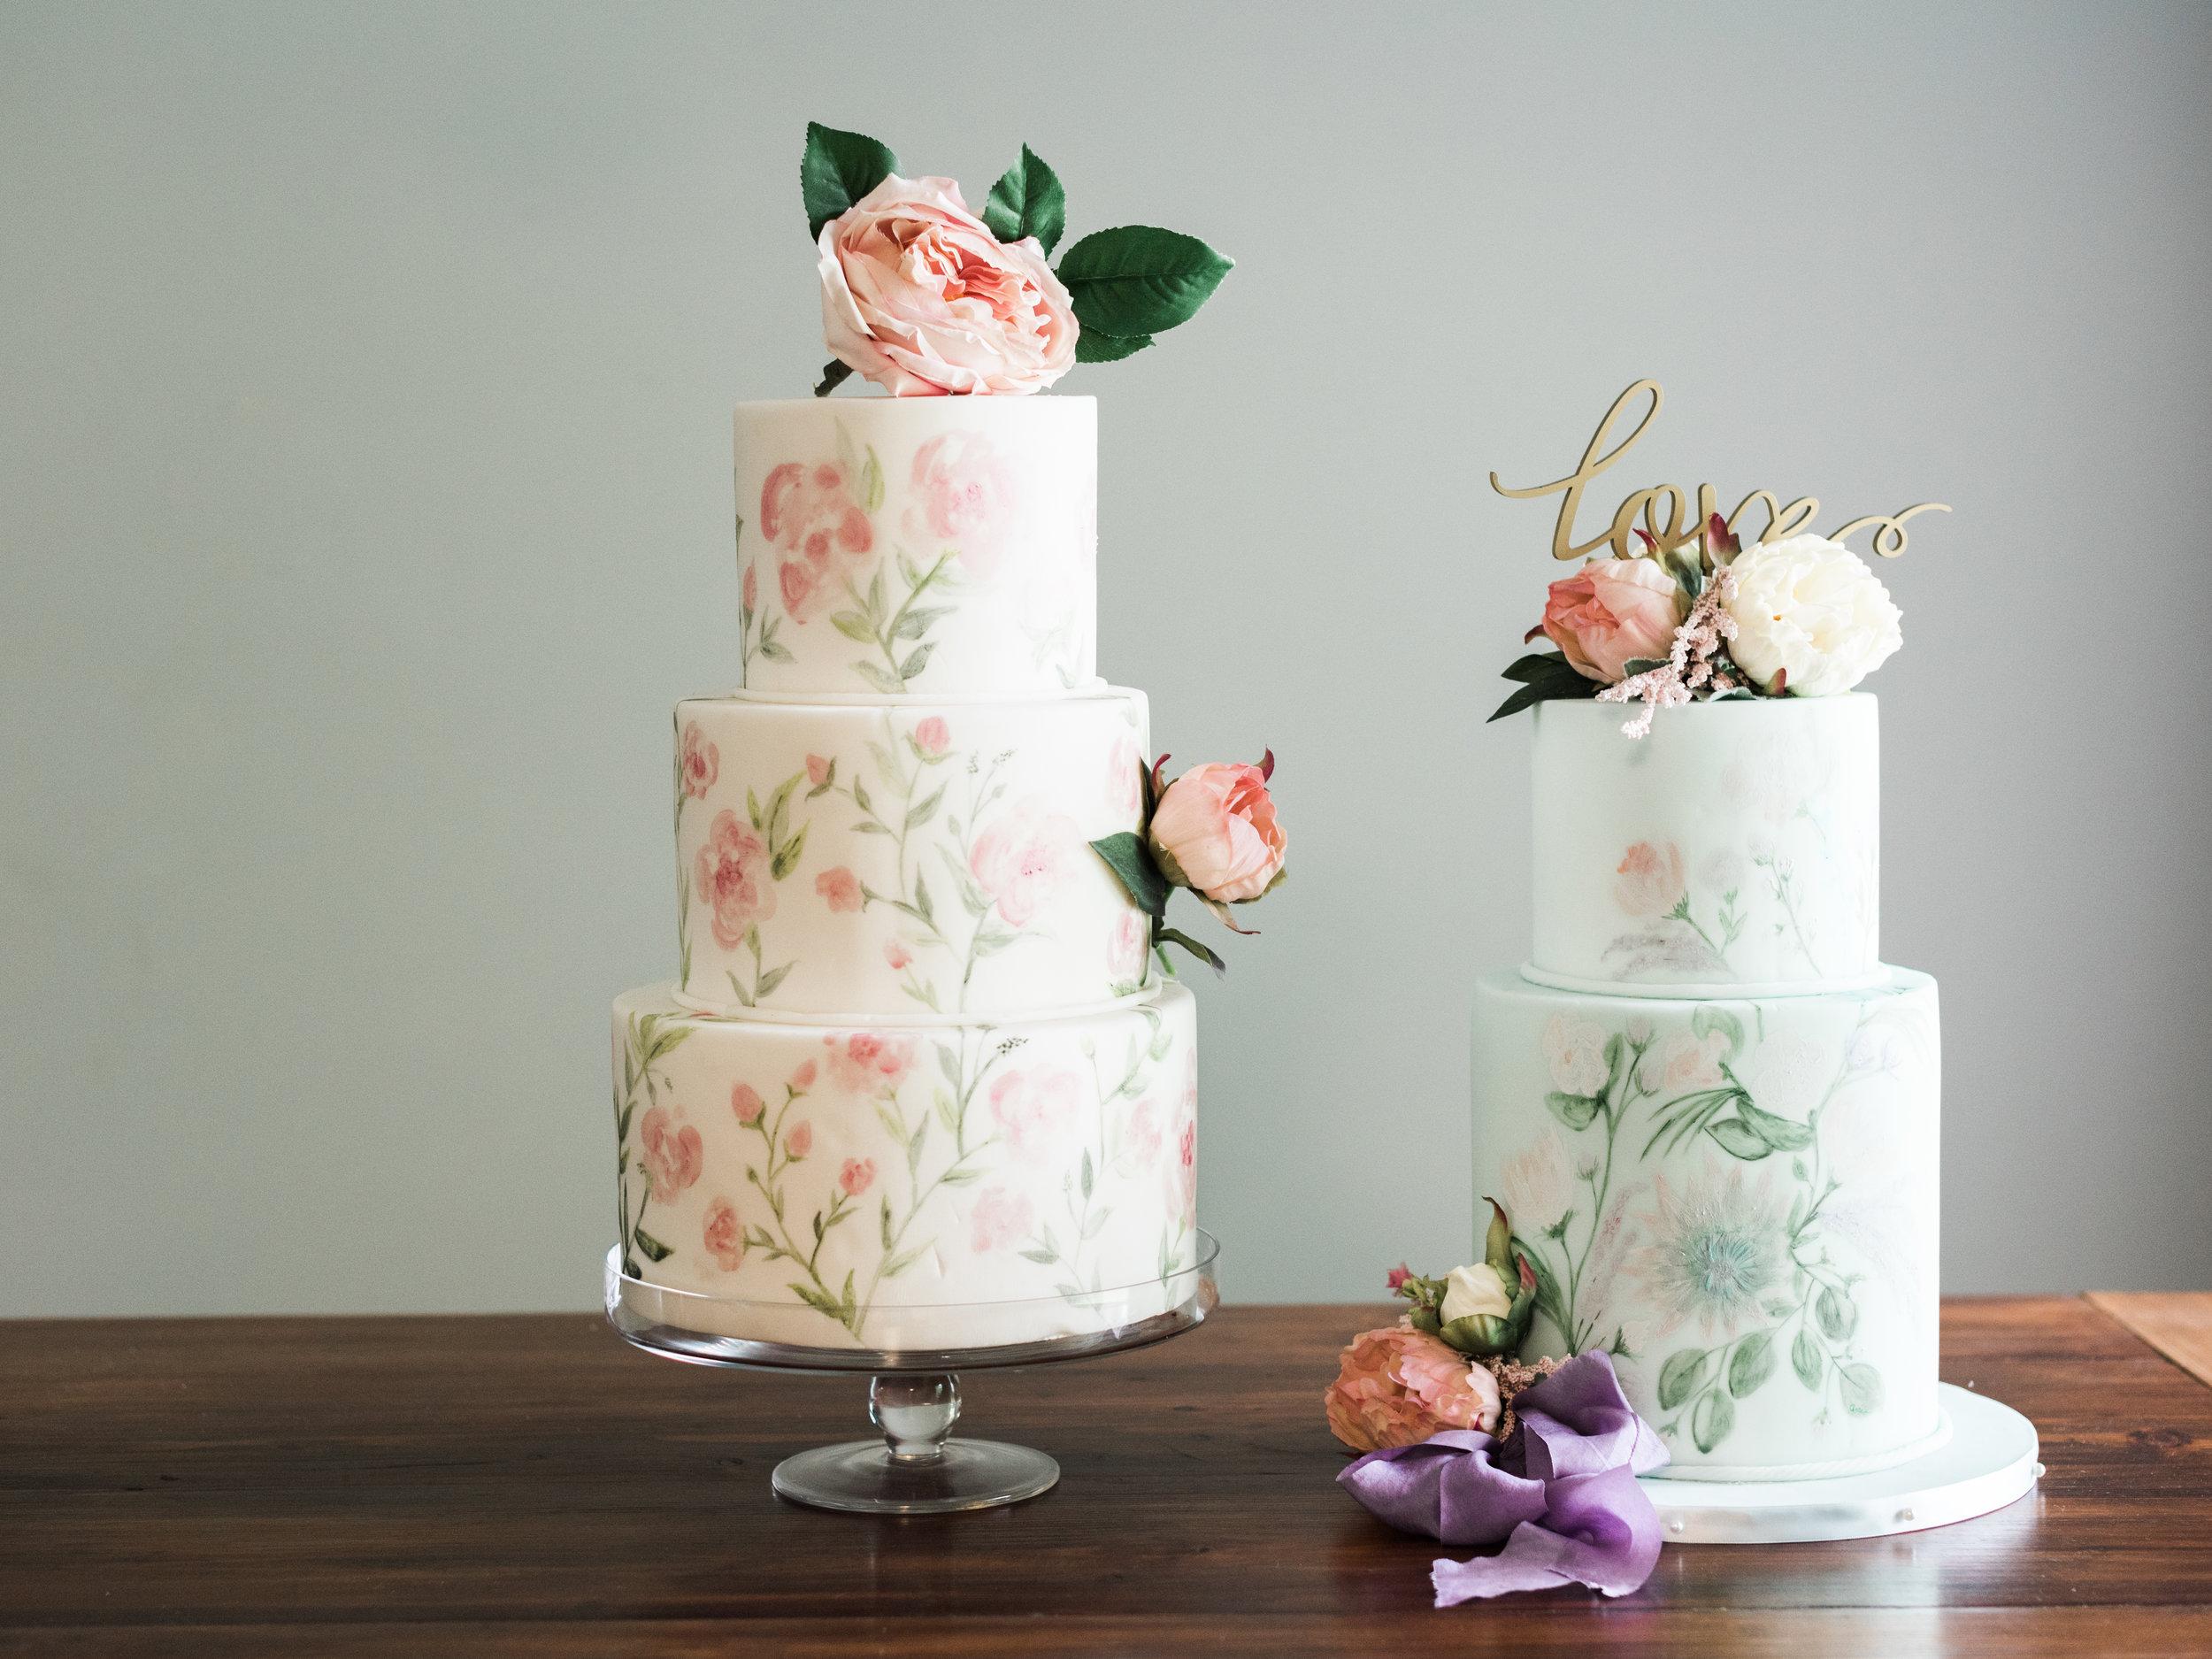 Amy_Cake6.jpg